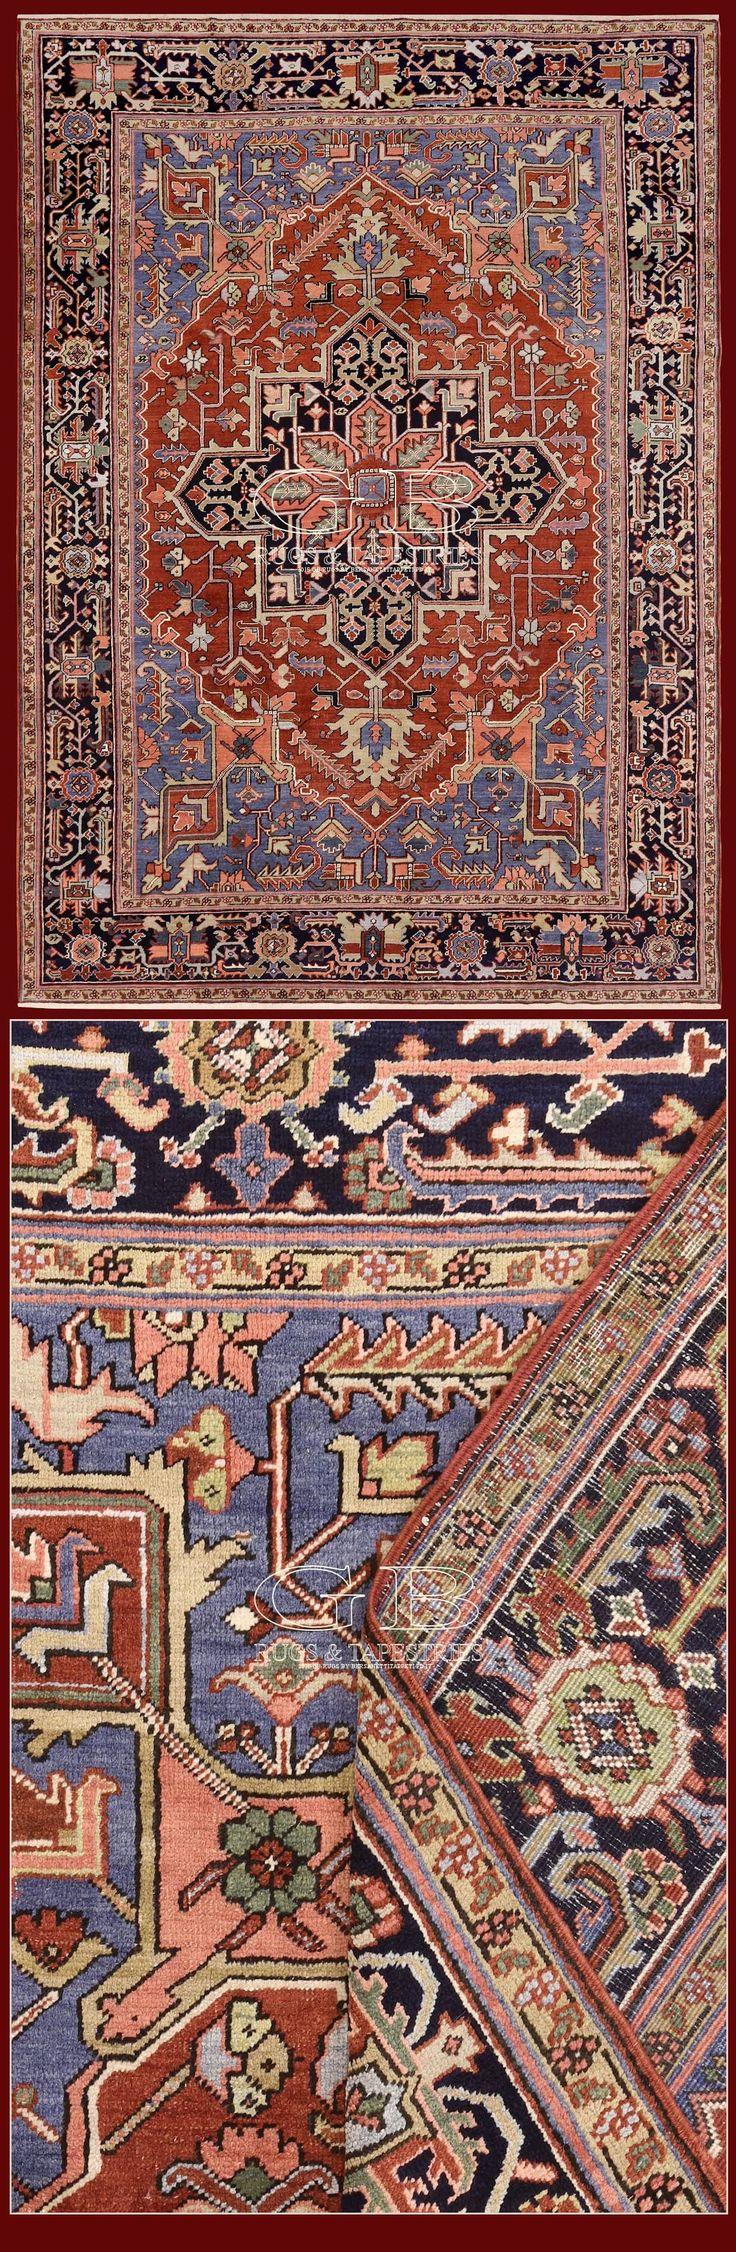 Antique Heriz Iran 365 X 234 Cm 11 98 7 68 Ft Cod